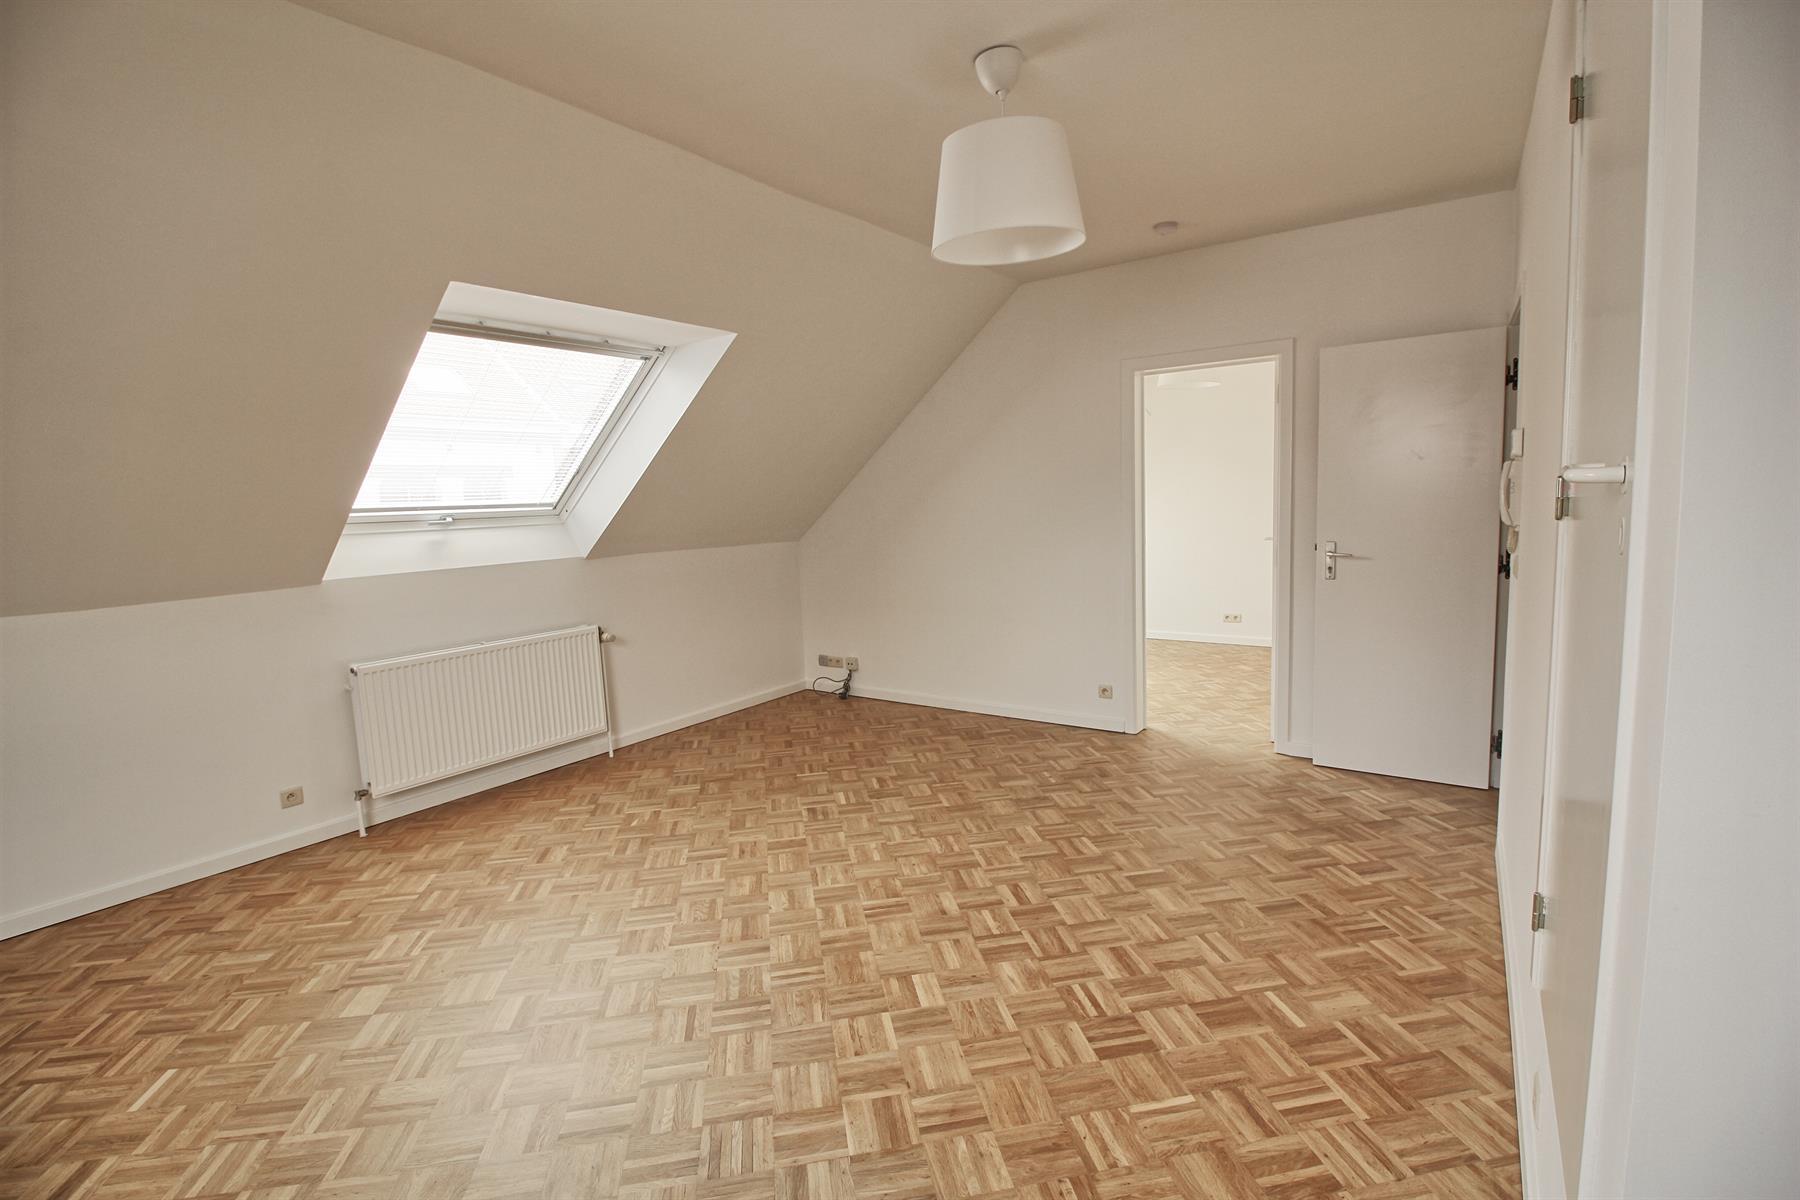 Flat - Etterbeek - #4277250-2